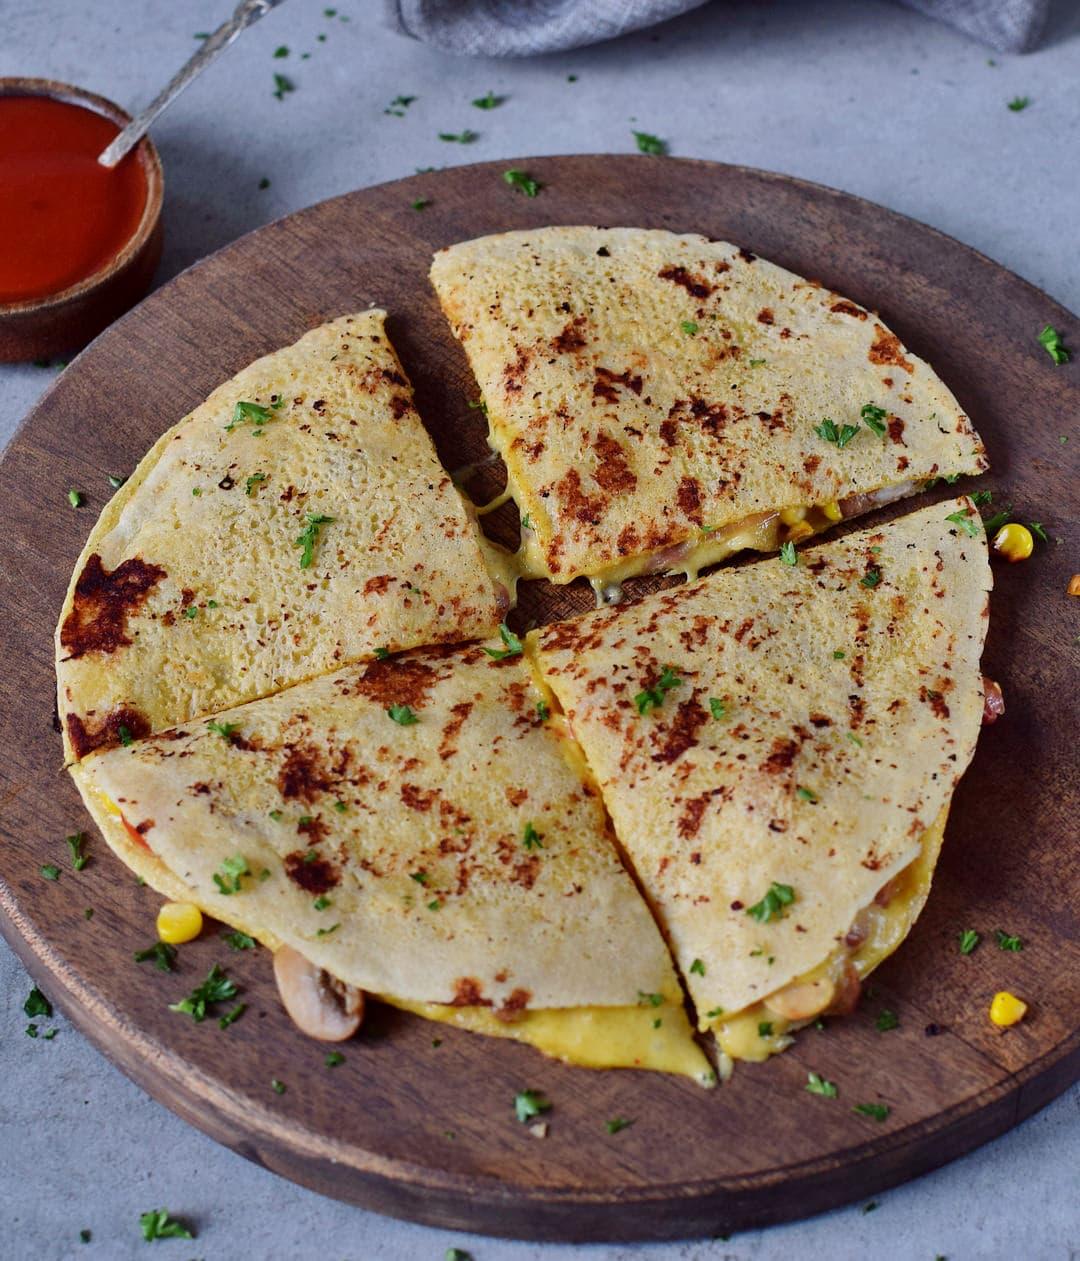 Vegane Quesadilla auf Holzbrett mit Käsesauce